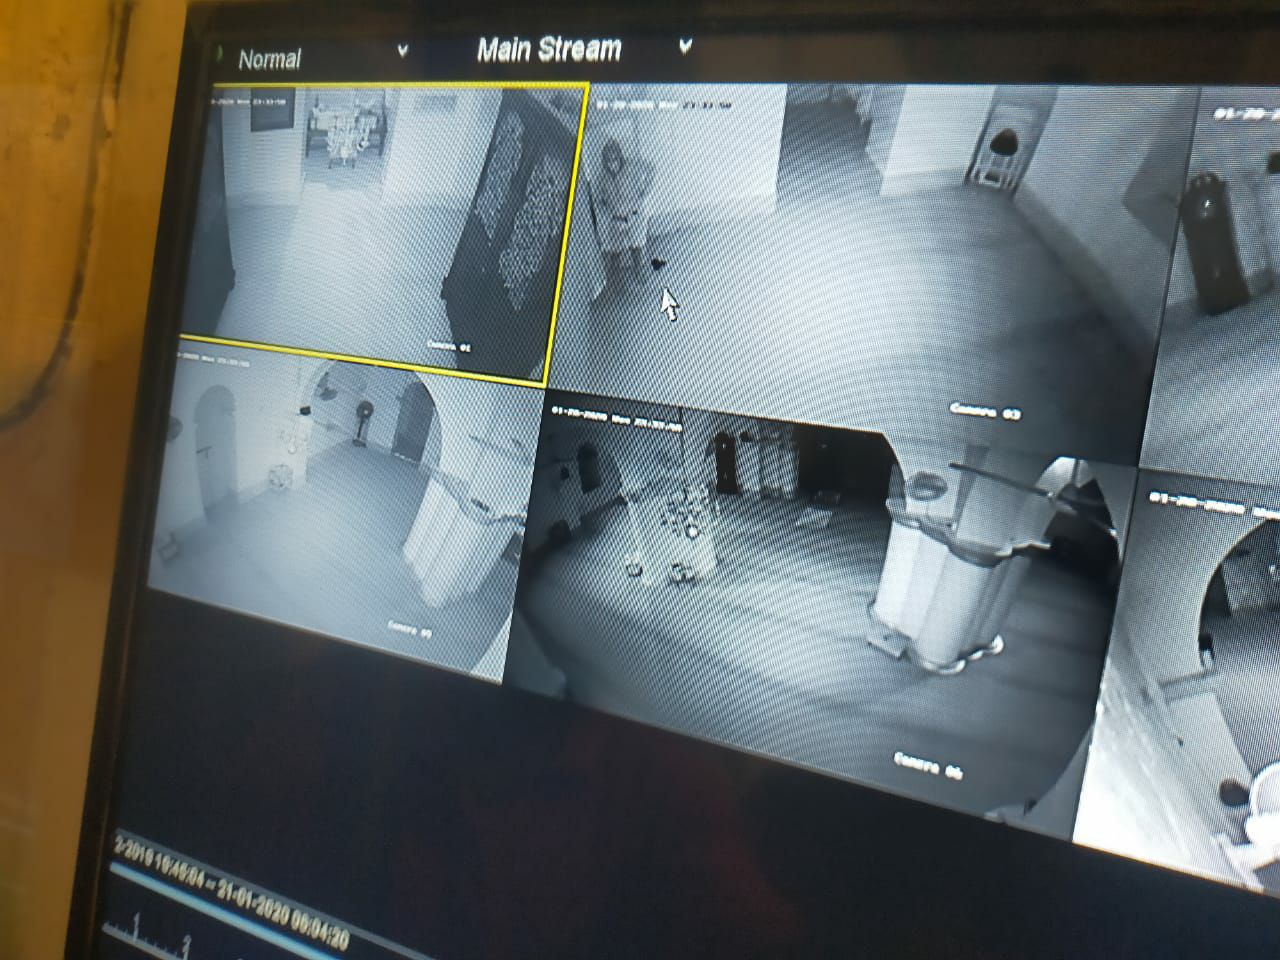 Kotak Infak Masjid Penyengat Dicuri Maling, Pelaku Terekam CCTv